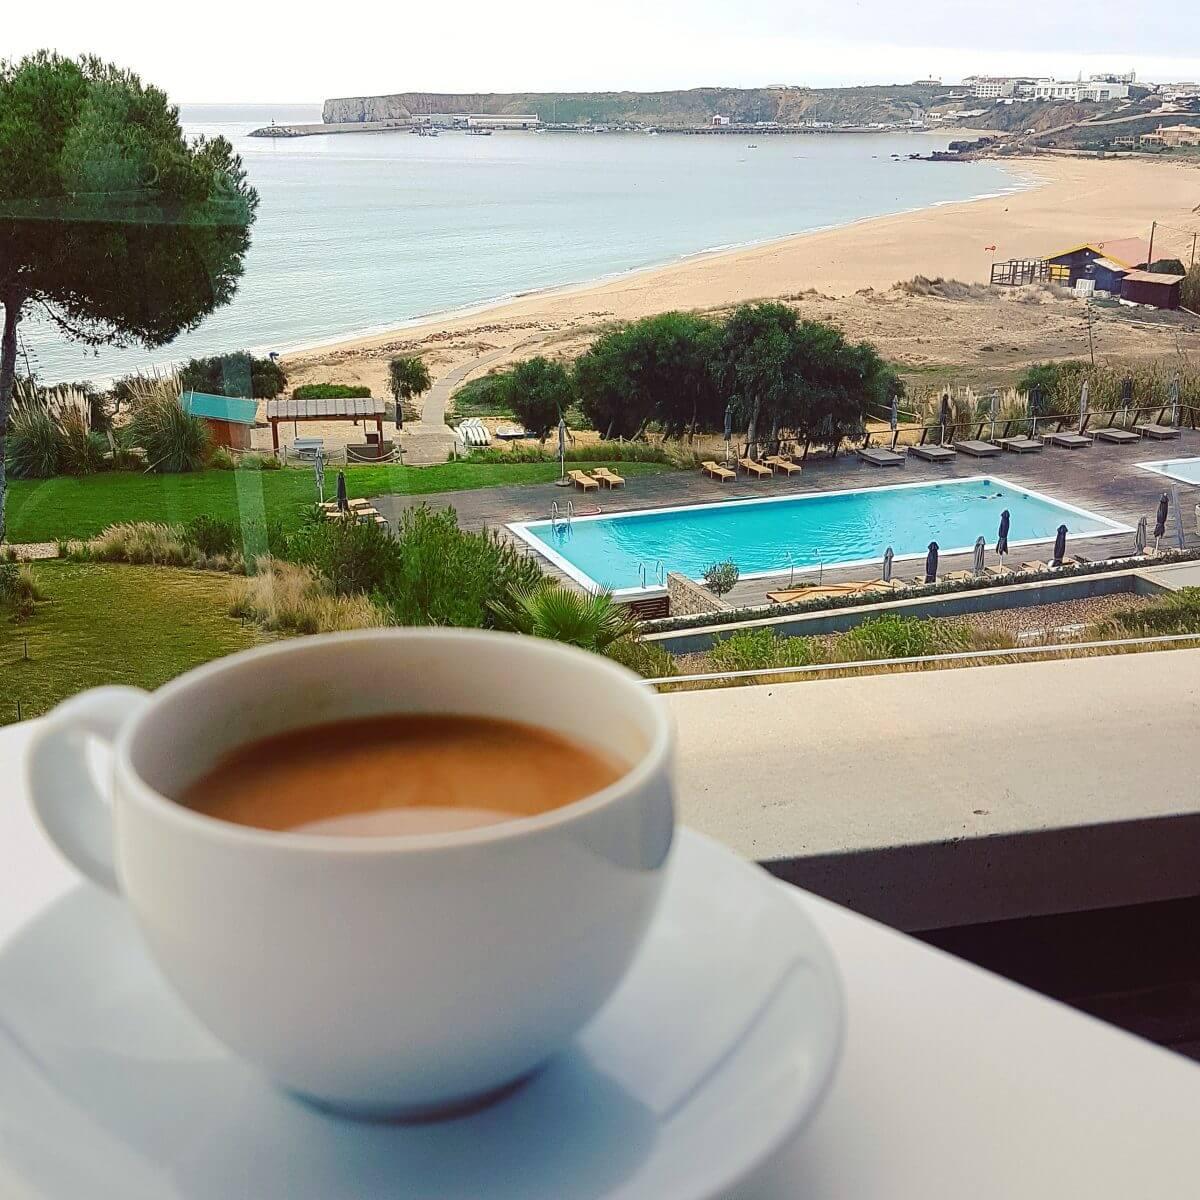 De leukste kindvriendelijke restaurants in de Algarve Sagres - Childfriendly restaurants Algarve with kids - Martinhal O Terraco strand en zwembad